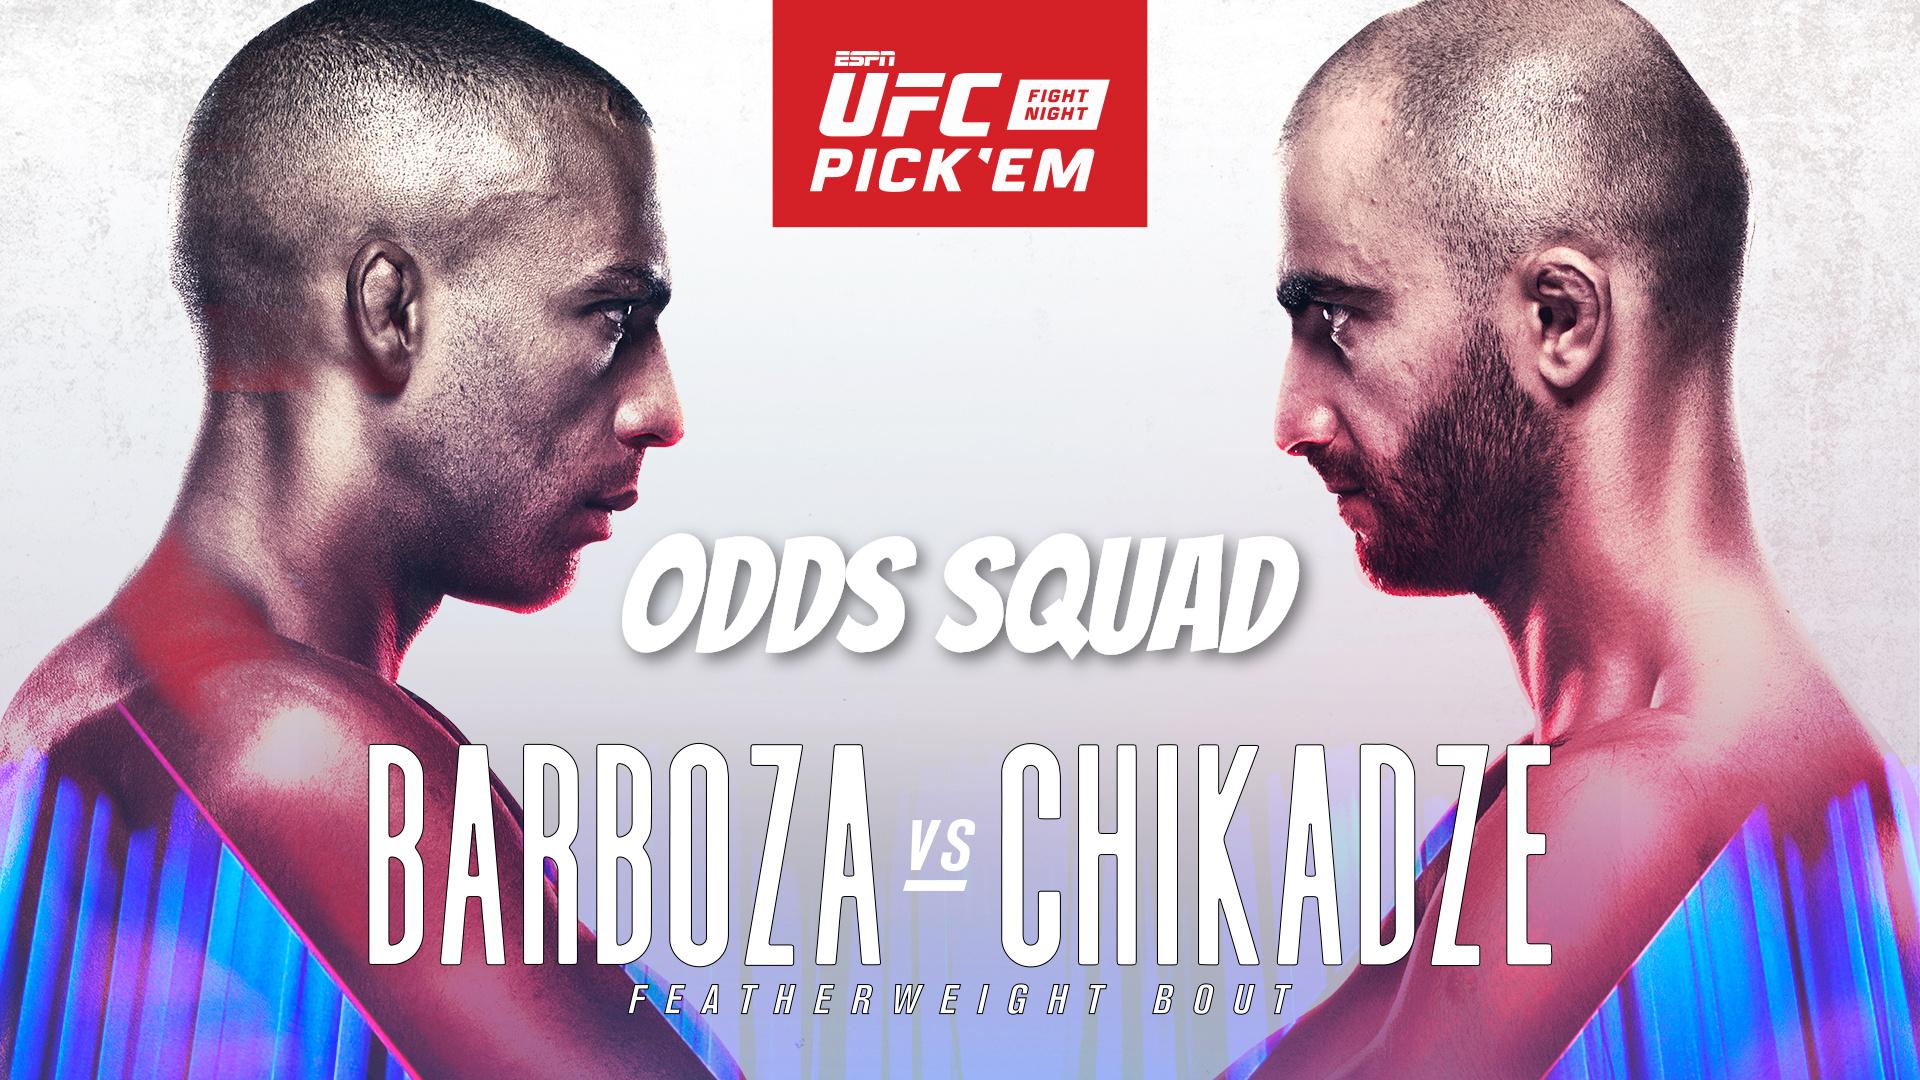 ufc vegas 35 barboza chikadze odds squad